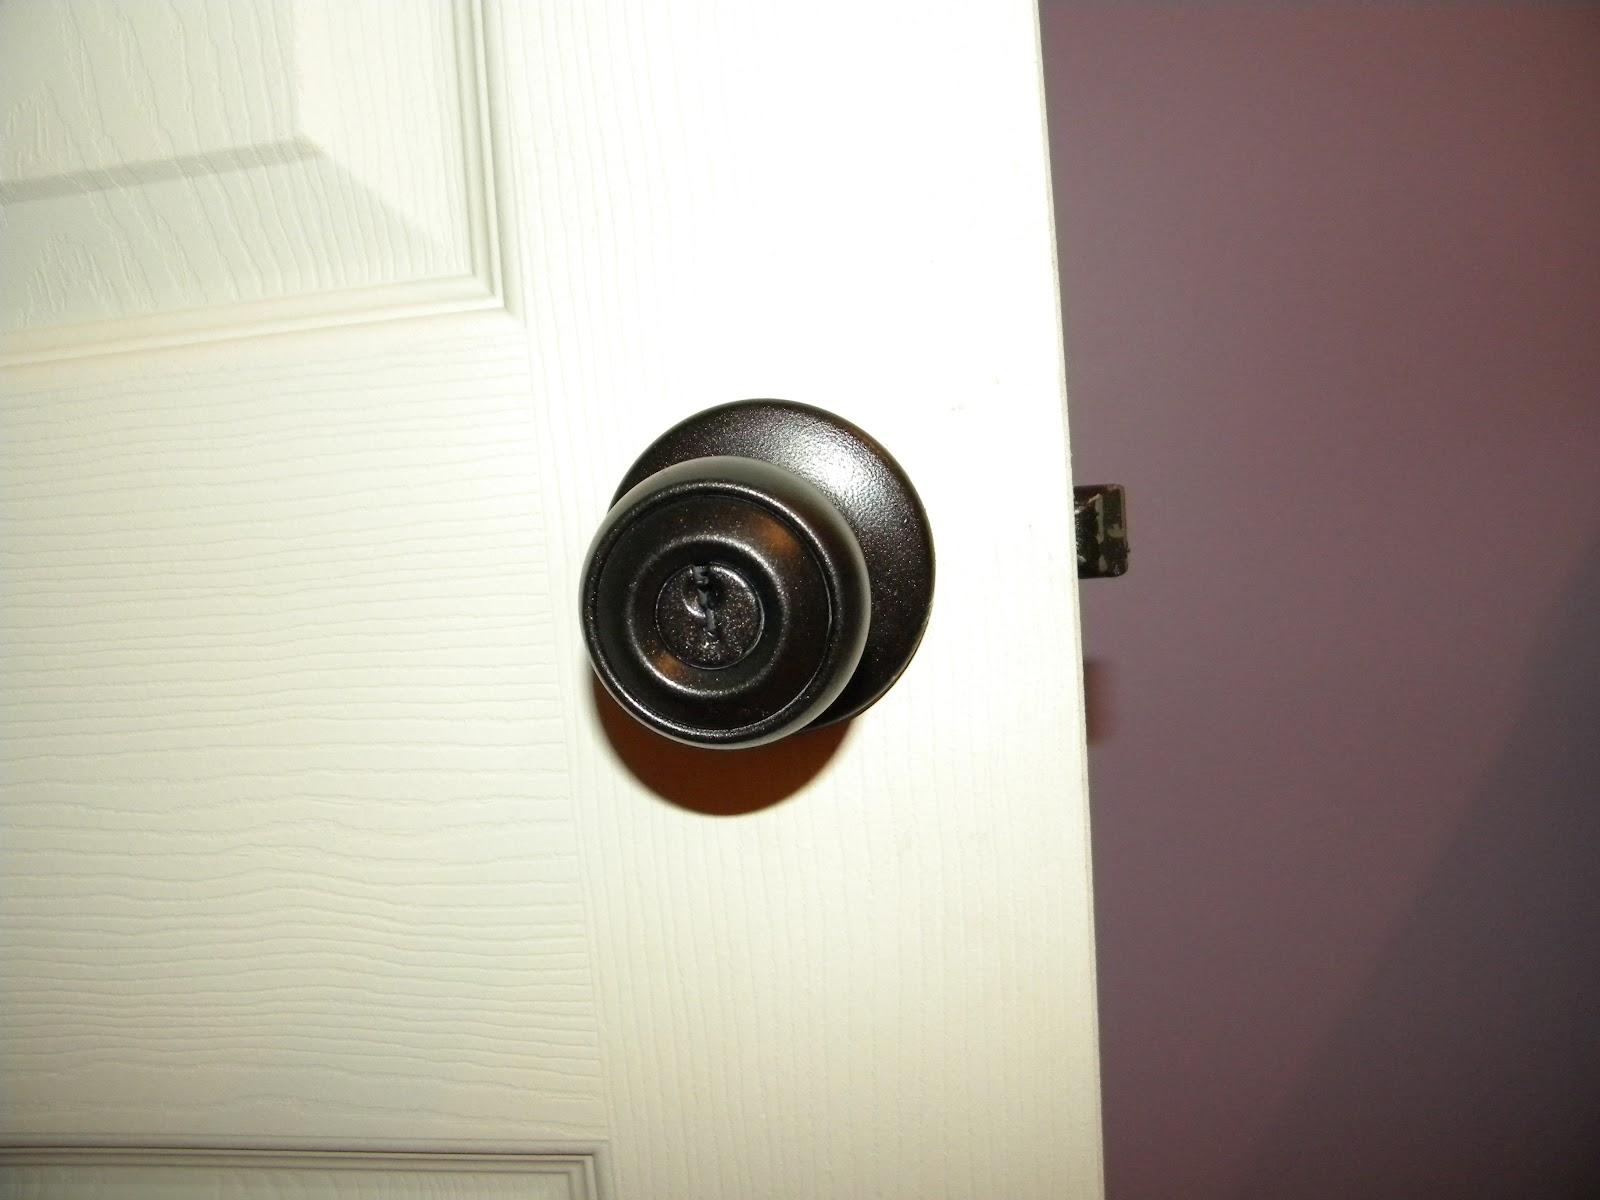 cheap oil rubbed bronze door knobs photo - 10